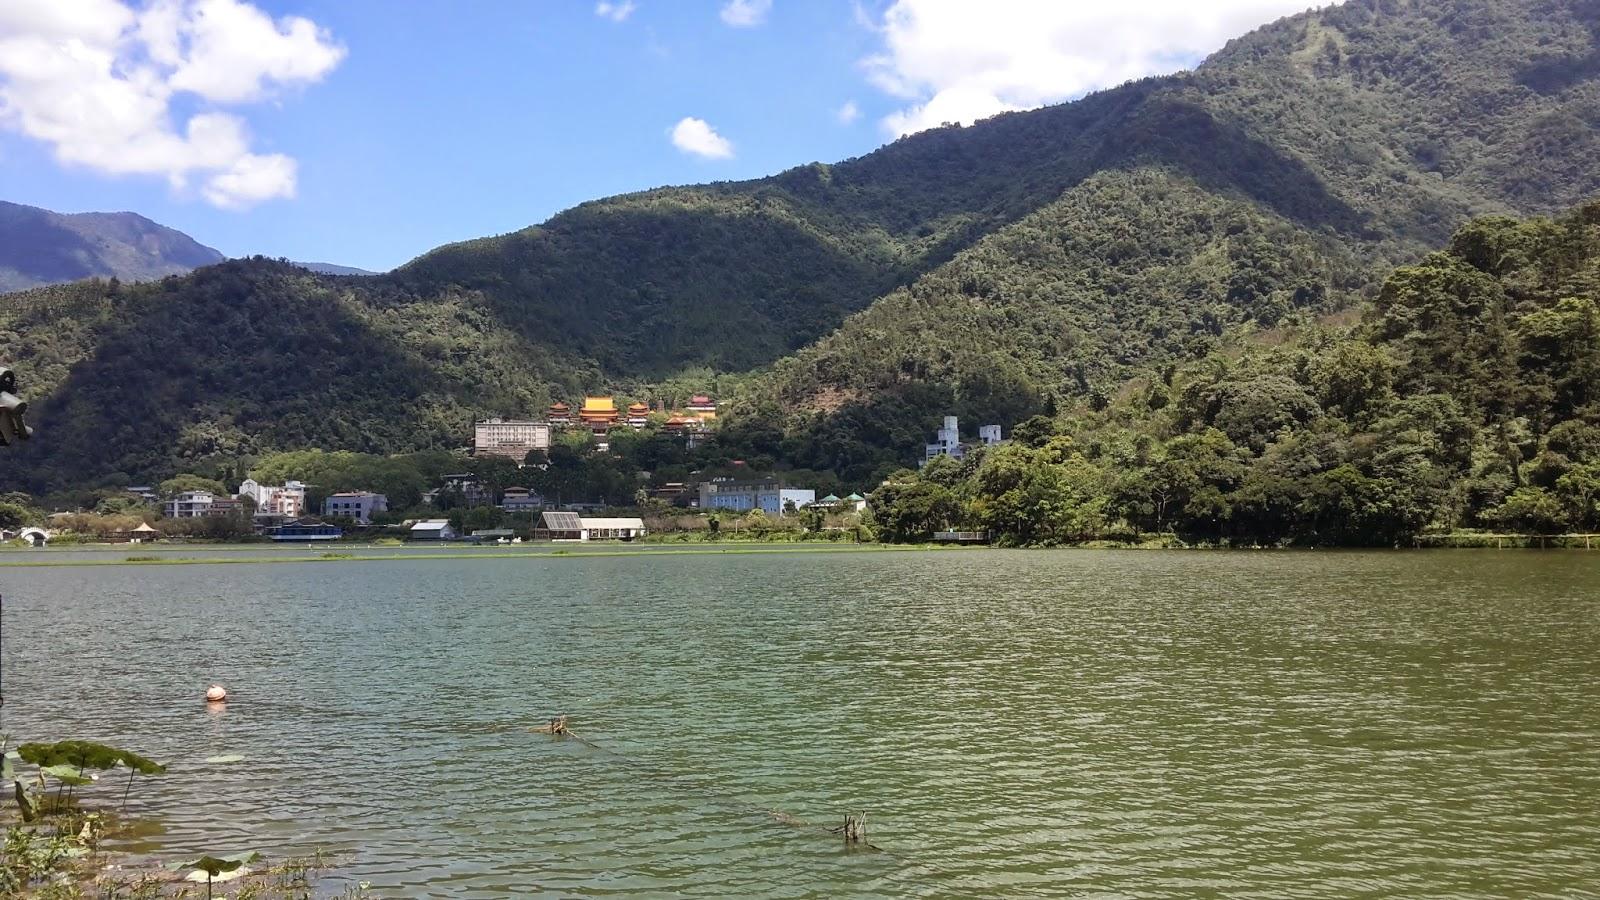 Thomas La Grua's Journey to Life: Liyu Lake